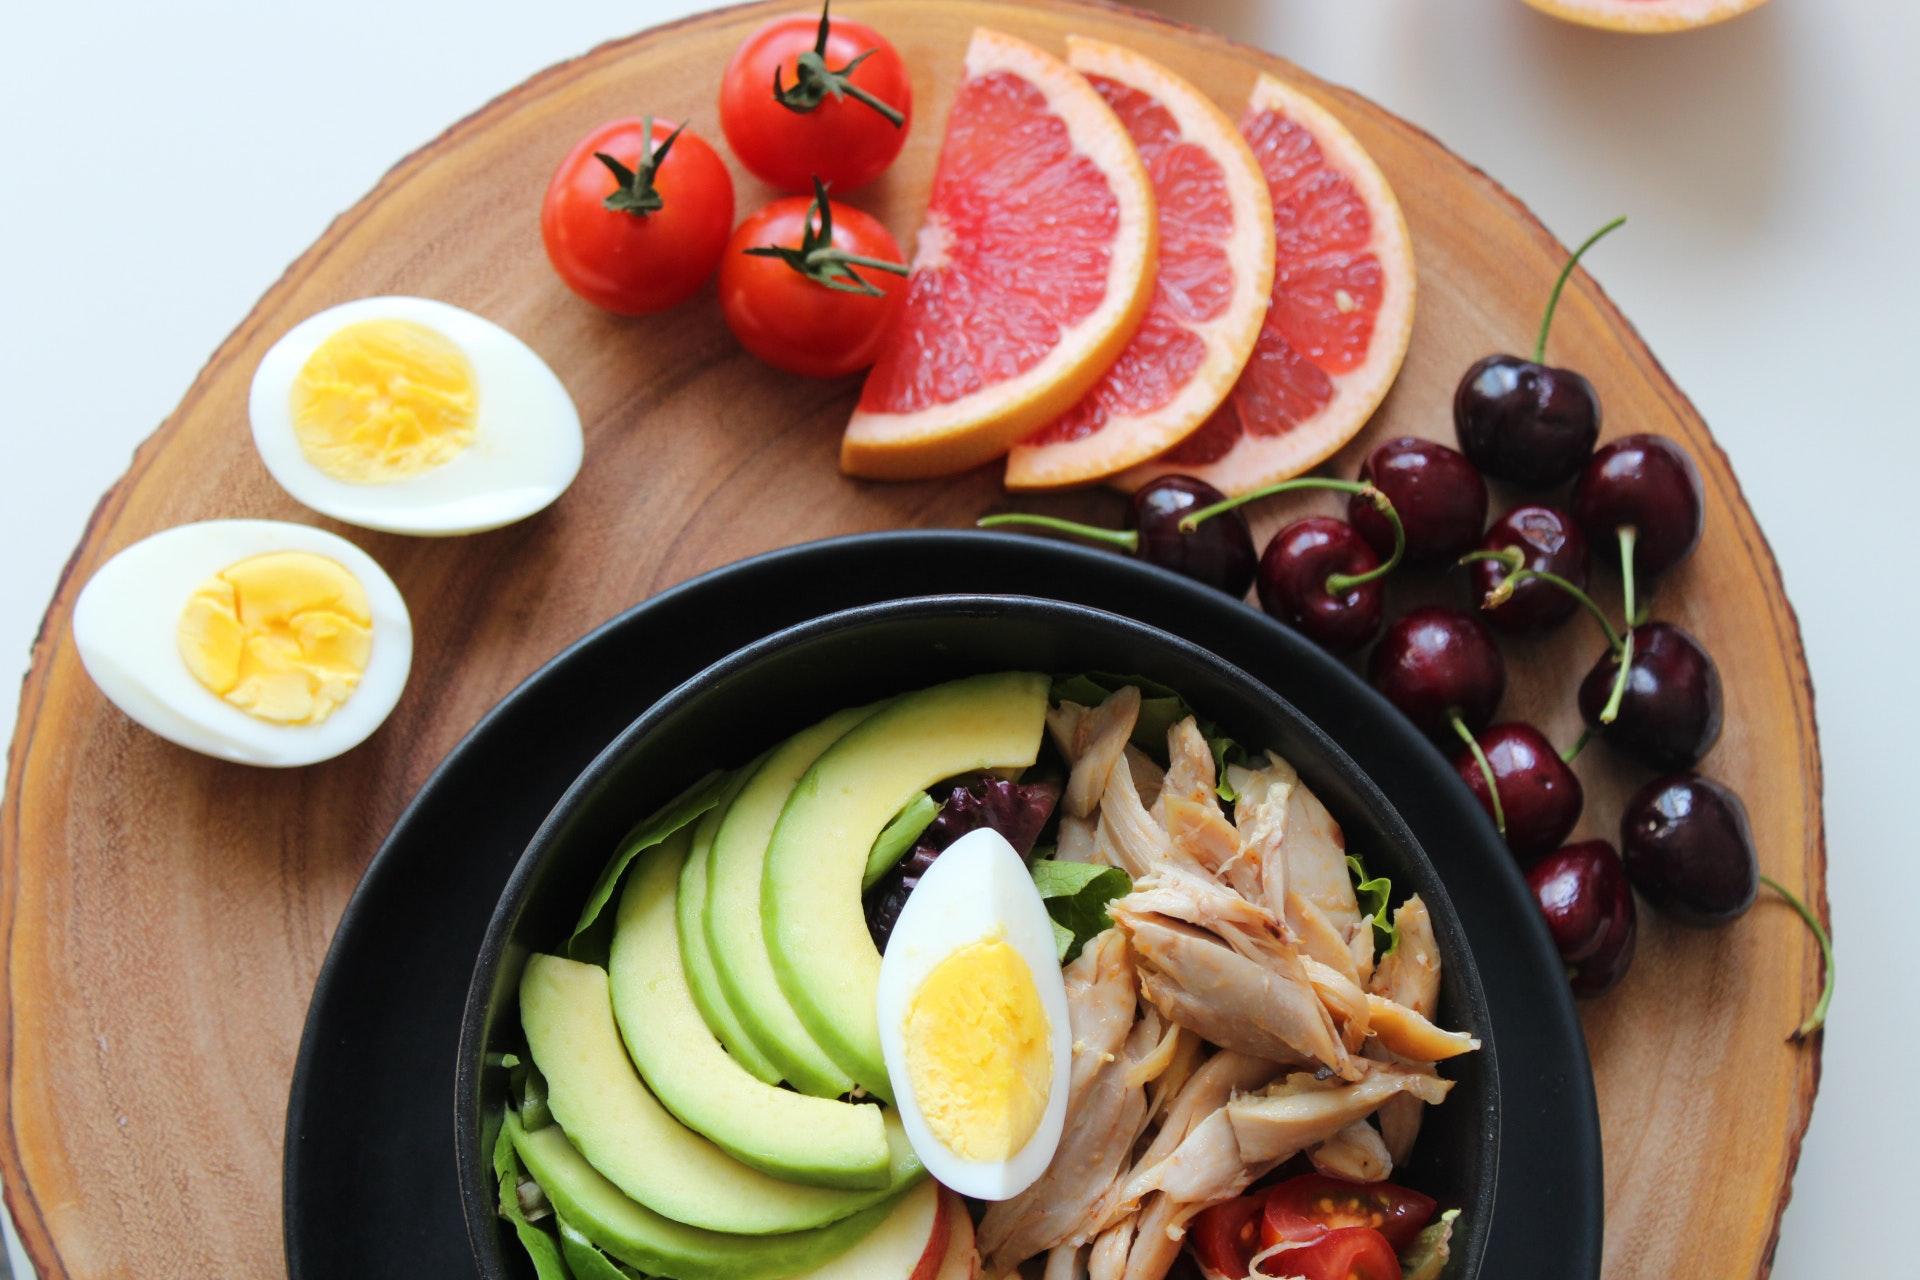 Dieta Montignac: come funziona, schema e menu